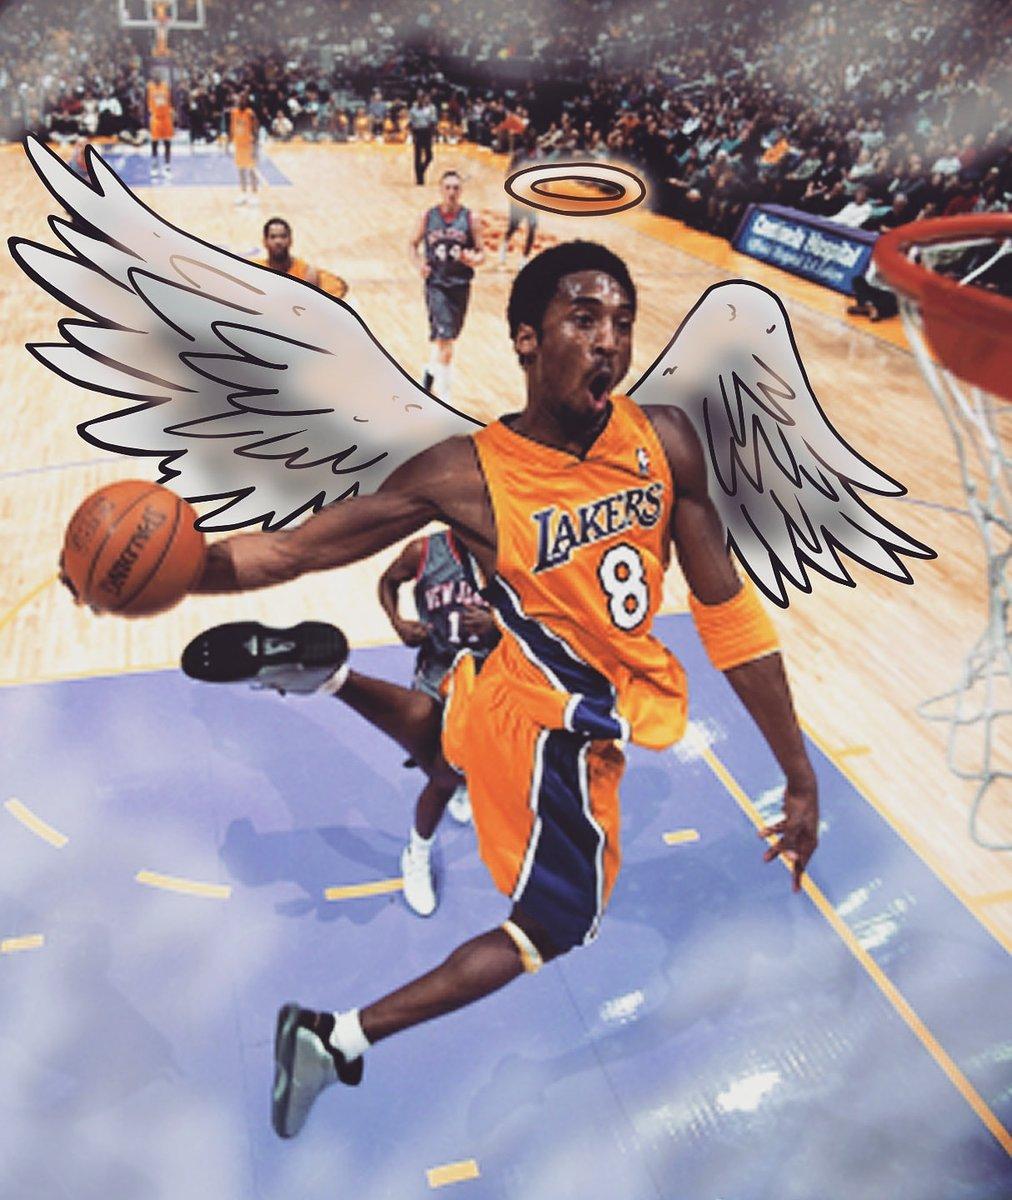 Long Live the Goat 🐐🐐🐐  #kobebryant #nba #kobe #lakers #lebronjames #basketball #mambamentality #k #blackmamba #lebron #michaeljordan #nike #ballislife #losangeles #life #losangeleslakers #mambaforever #ripkobe #jamesharden #jordan #lakersnation  #lalakers  #nbaplayoffs #mamba https://t.co/fHVRxO9q44